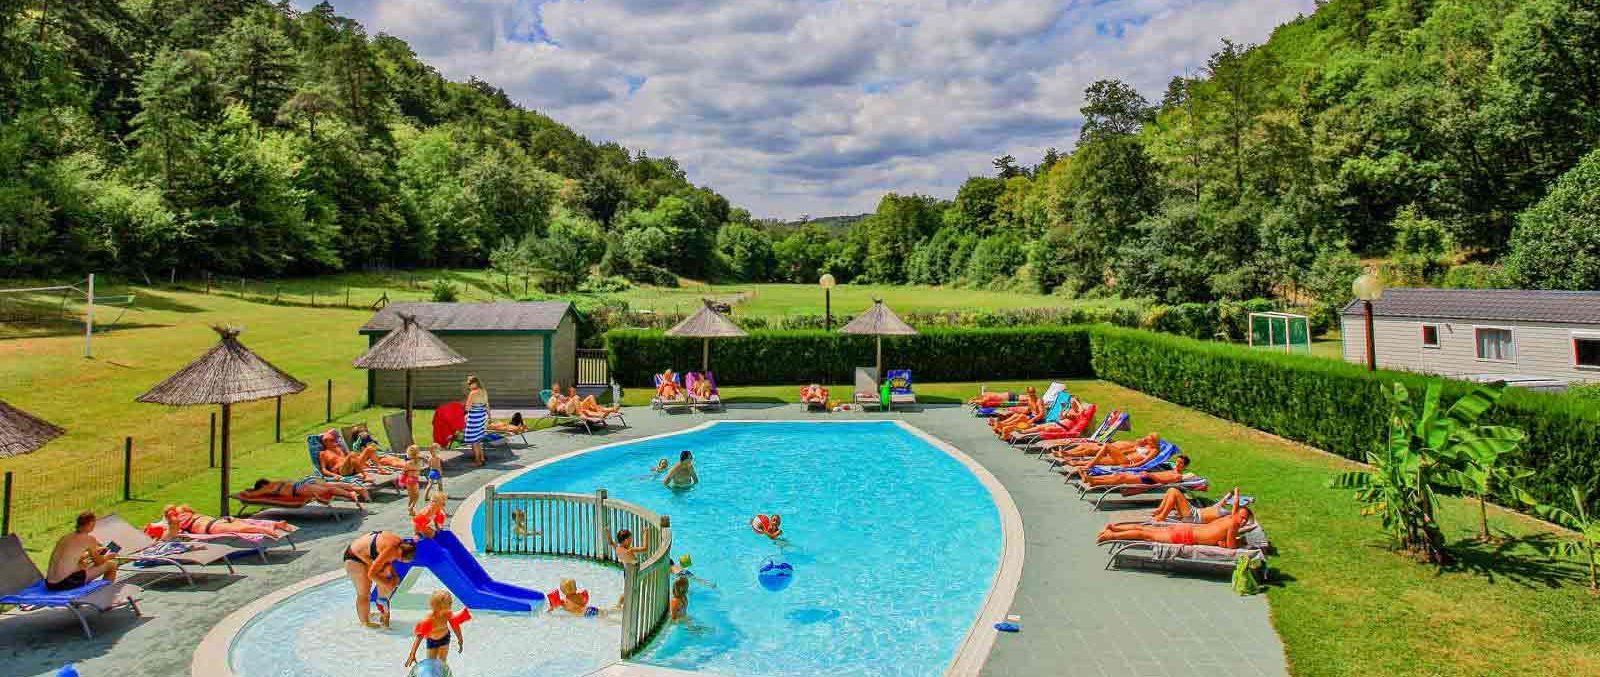 Camping Dordogne Perigord Noir | Vacances Camping En ... avec Location Dordogne Piscine